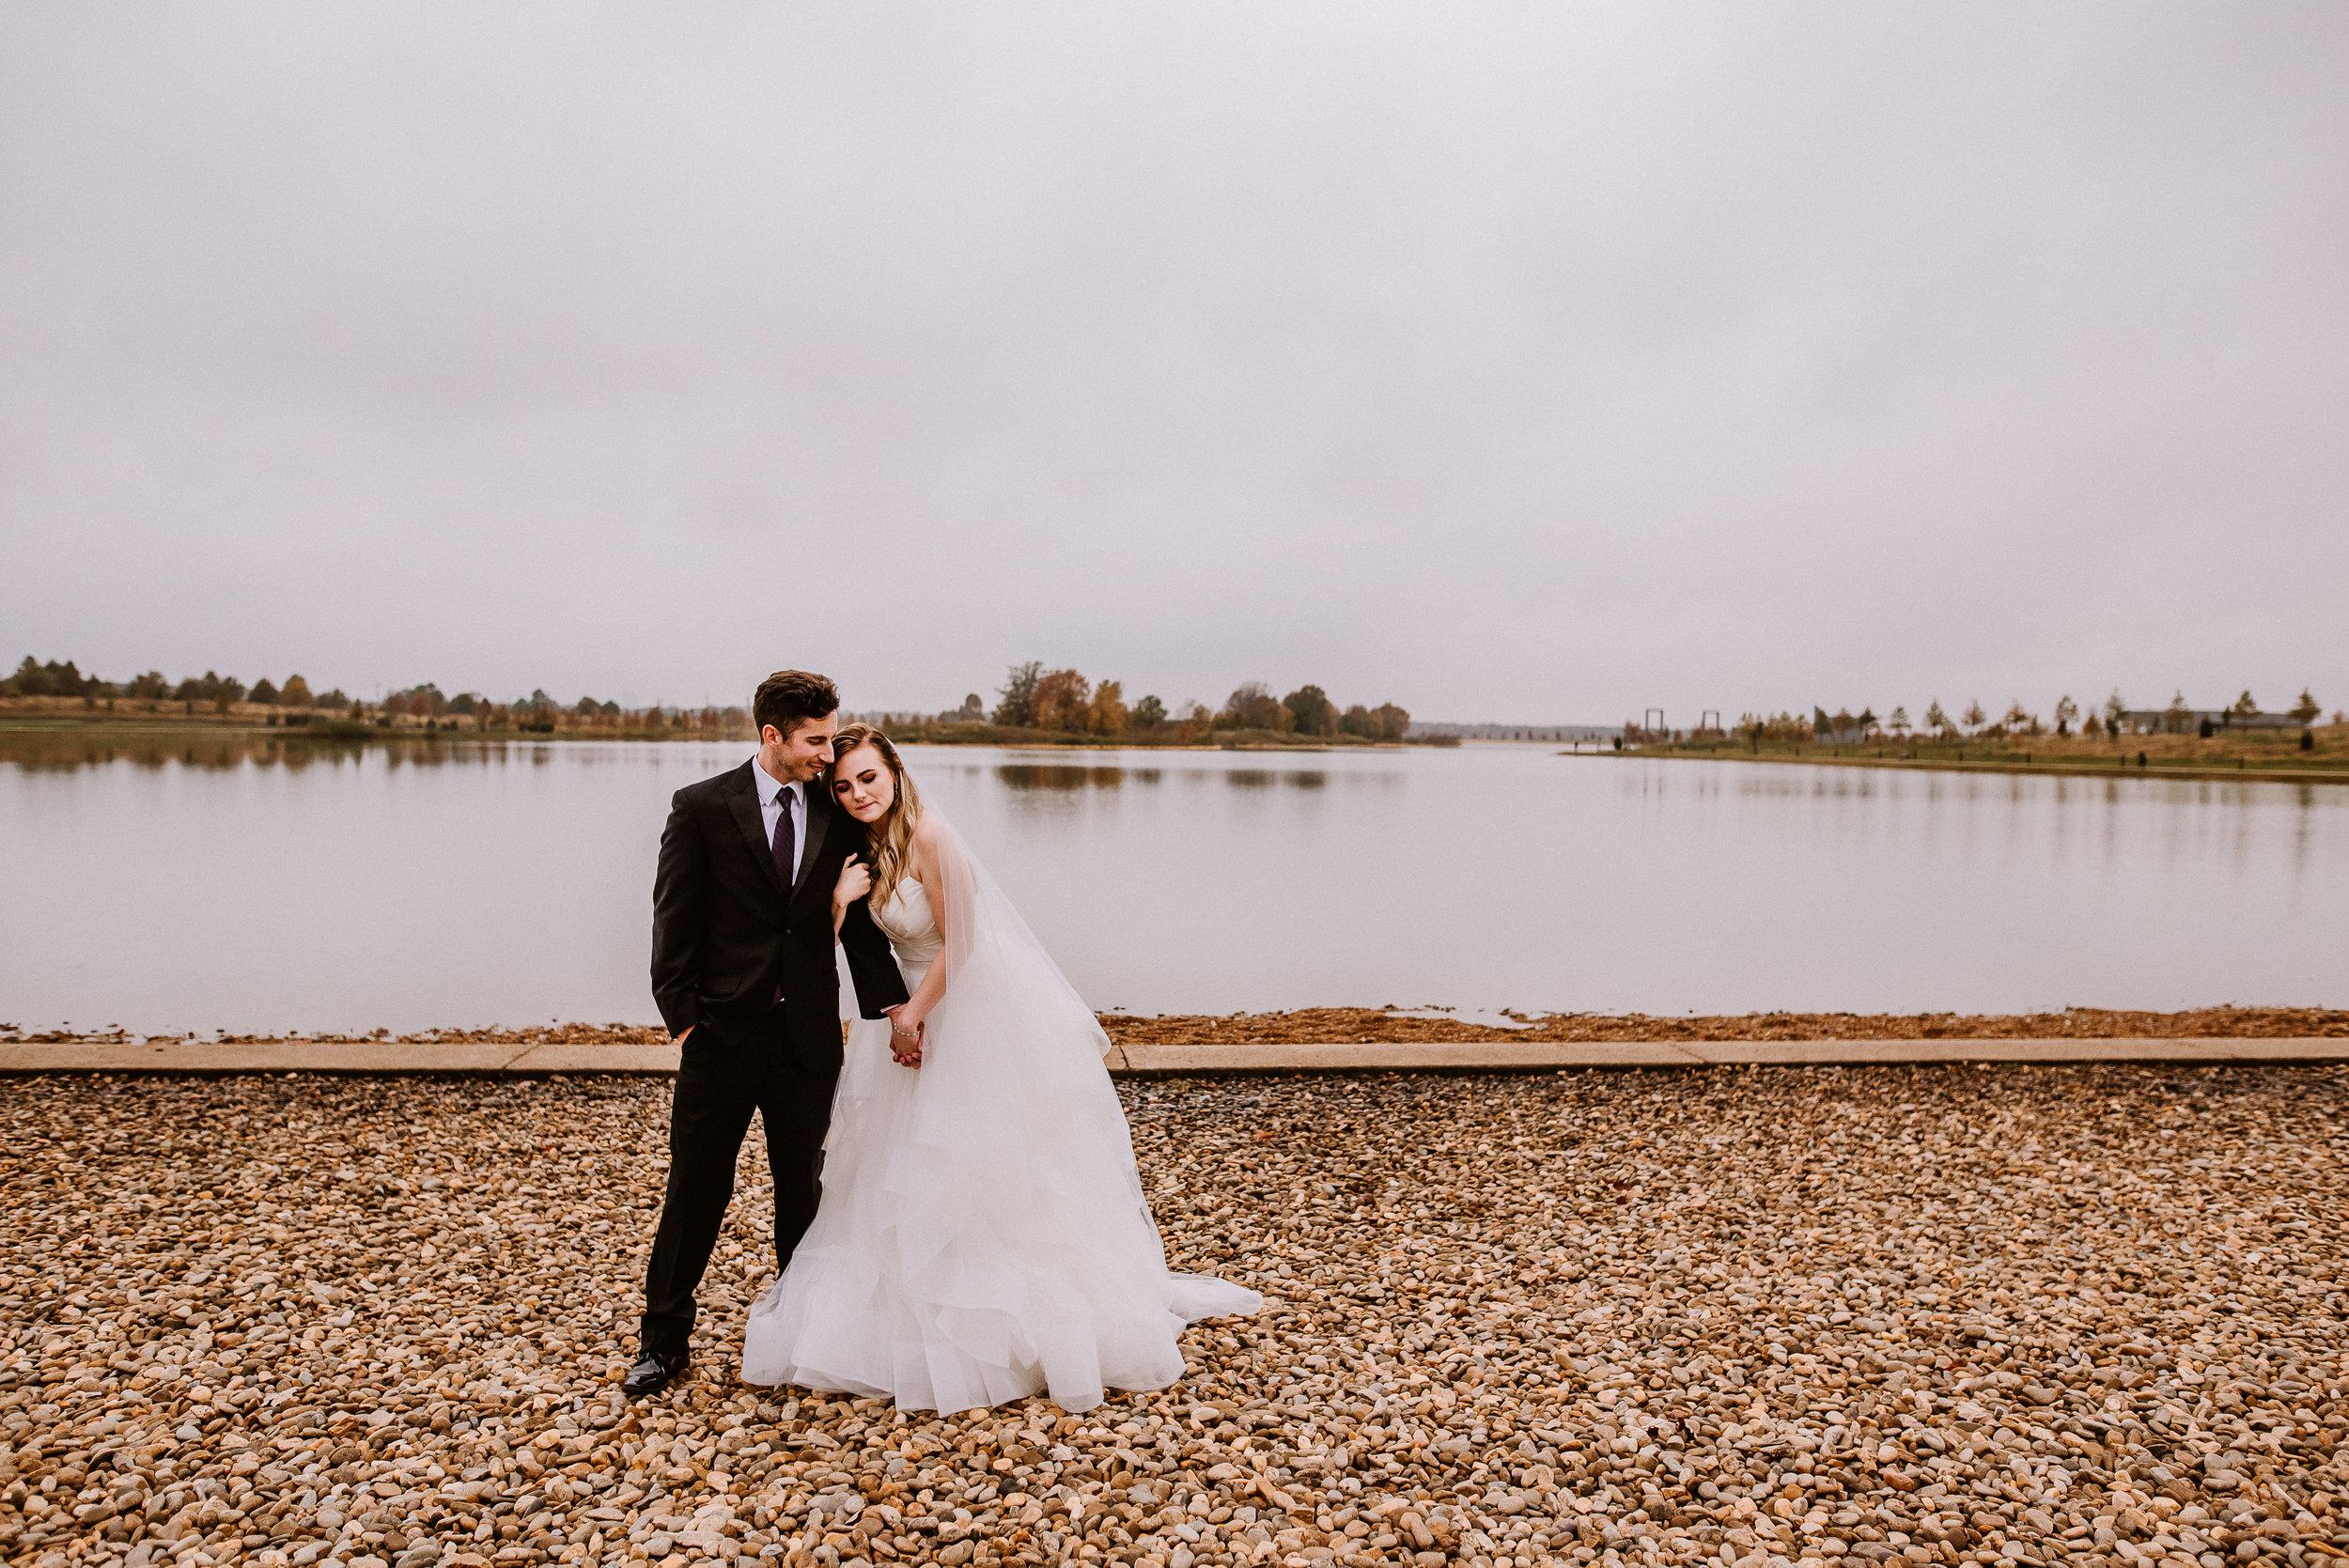 Lucchesi-Wedding_Shelby-Farms_Ashley-Benham-Photography-513.jpg